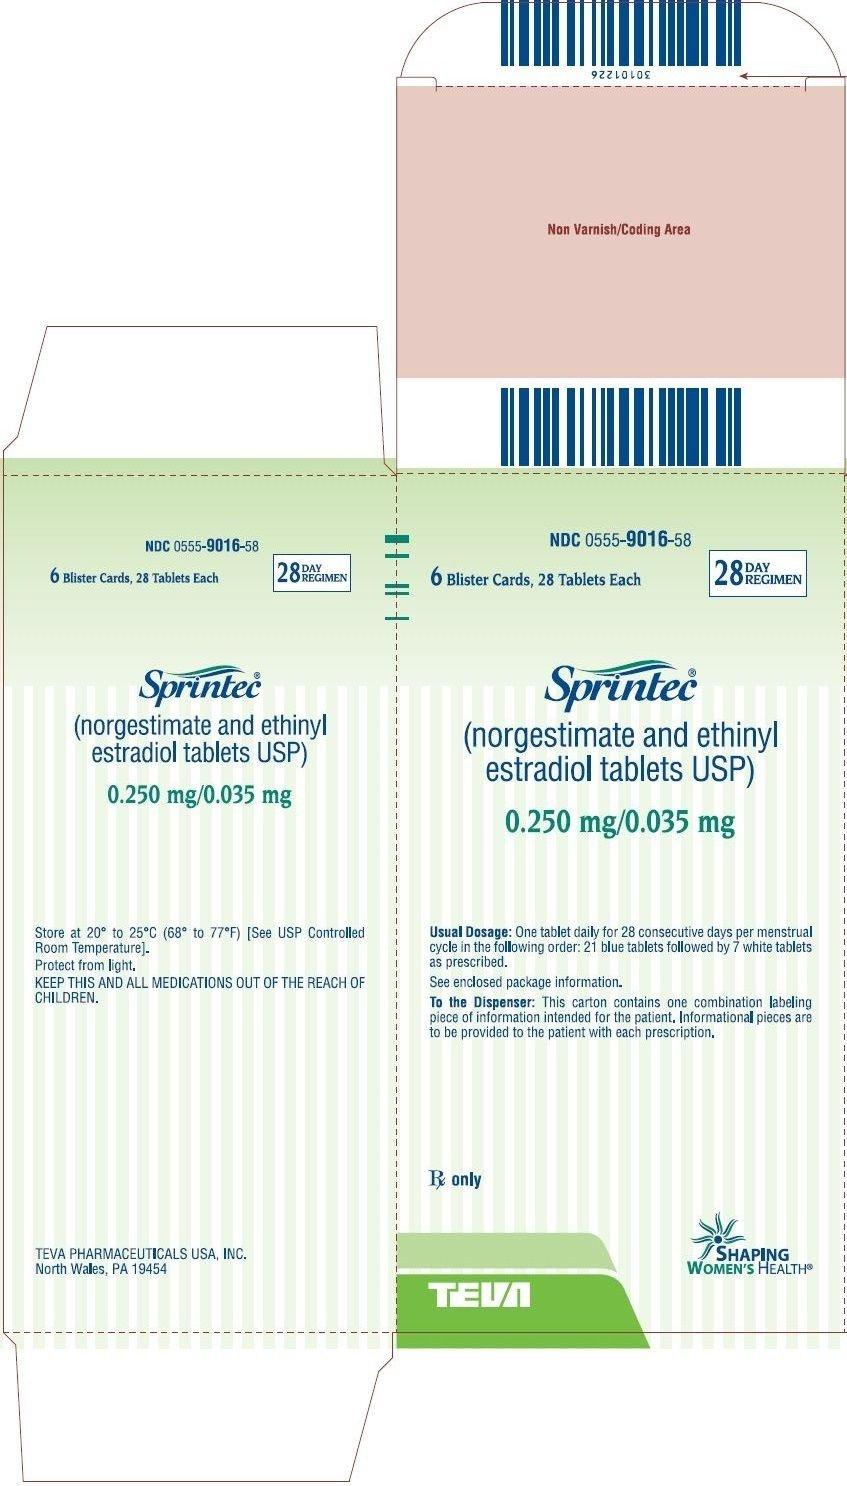 Universal Calendar For Medications 28 Days Expiration 28 Day Medication Expiration